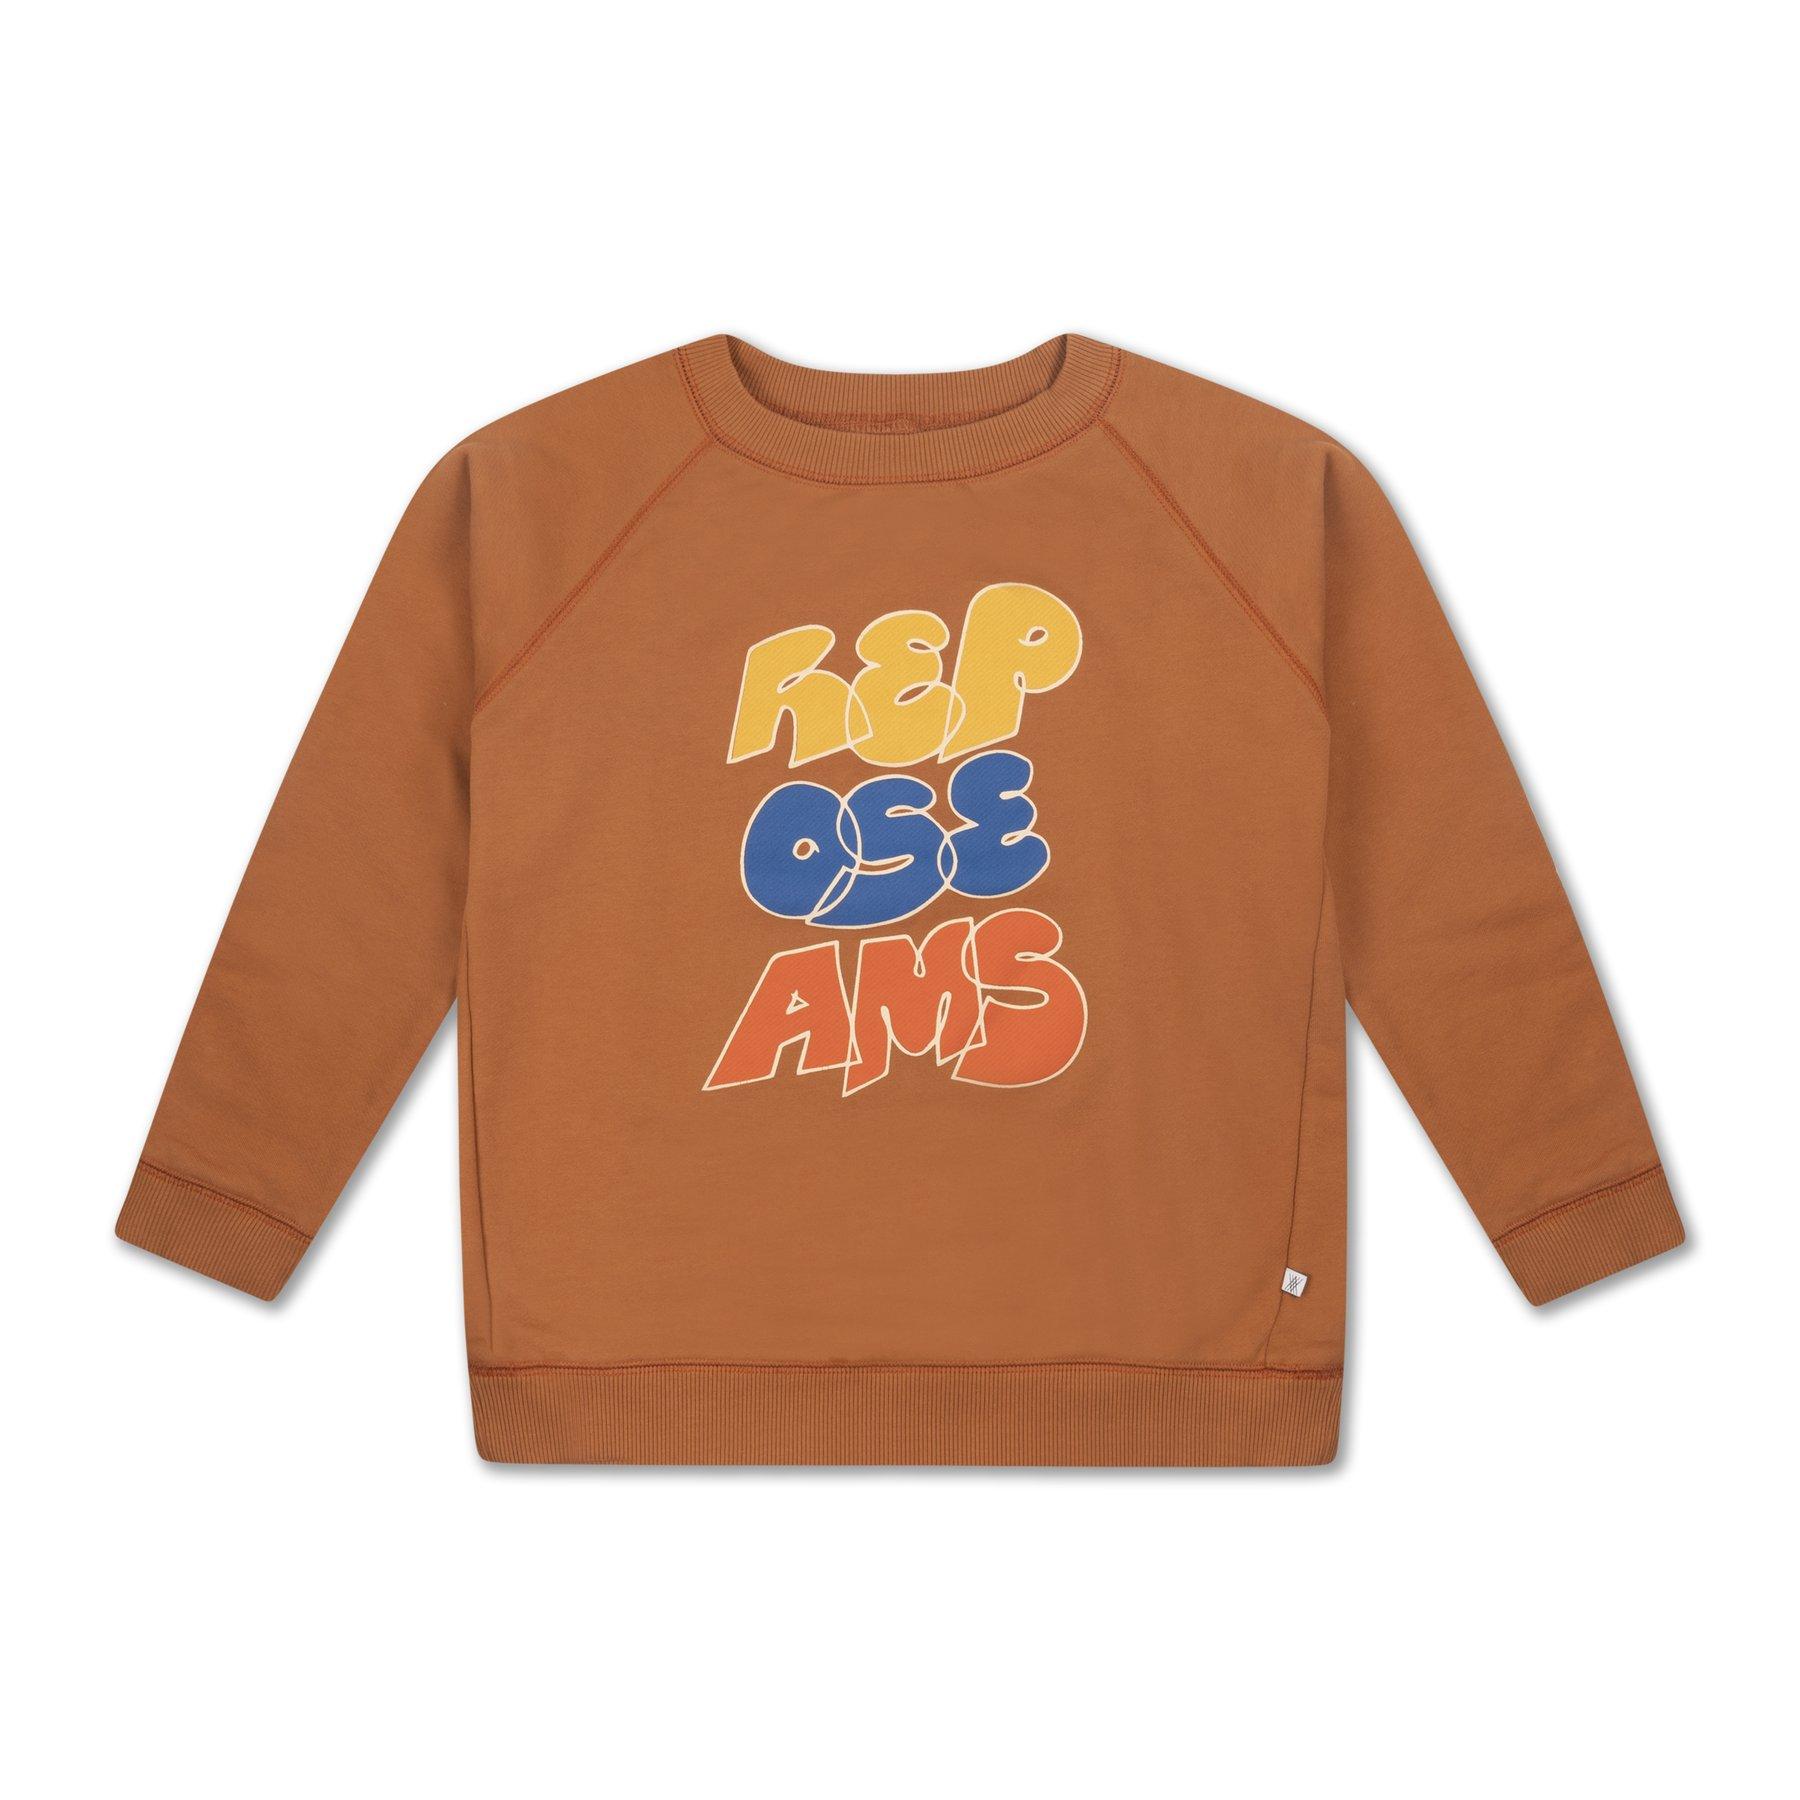 Repose AMS - Sweatshirt Warm Hazel